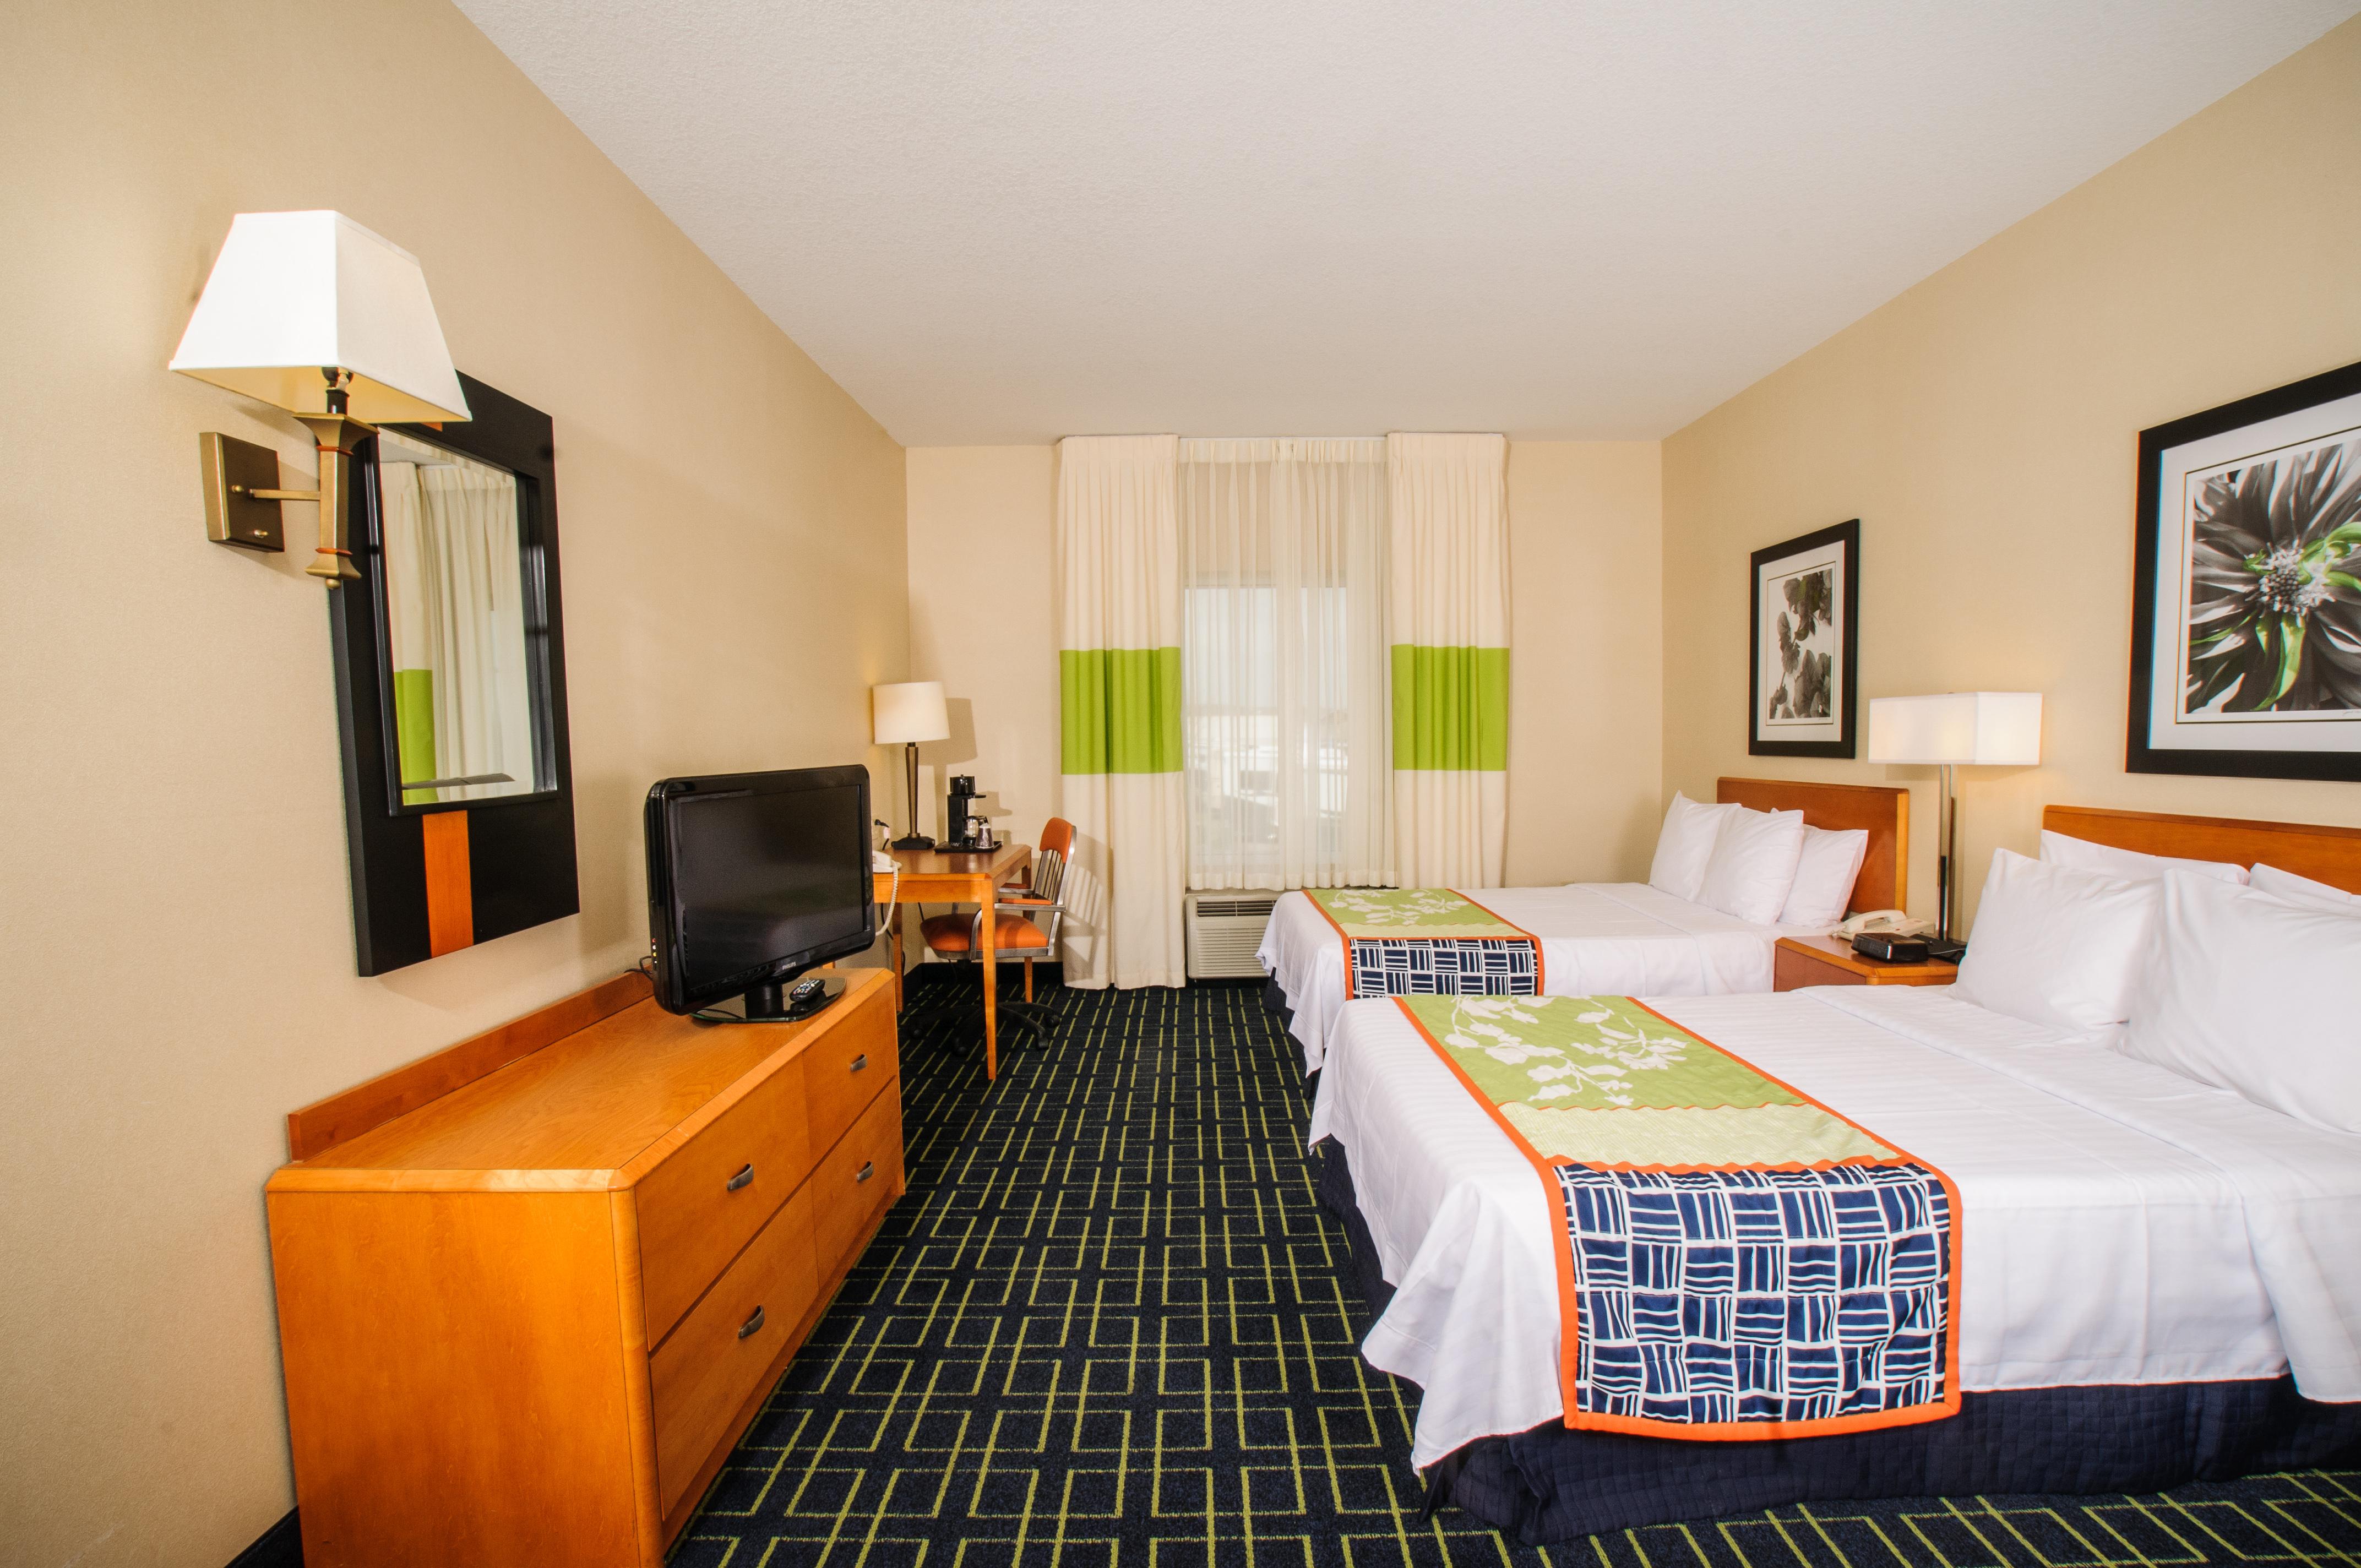 Fairfield Inn & Suites by Marriott Akron South image 19